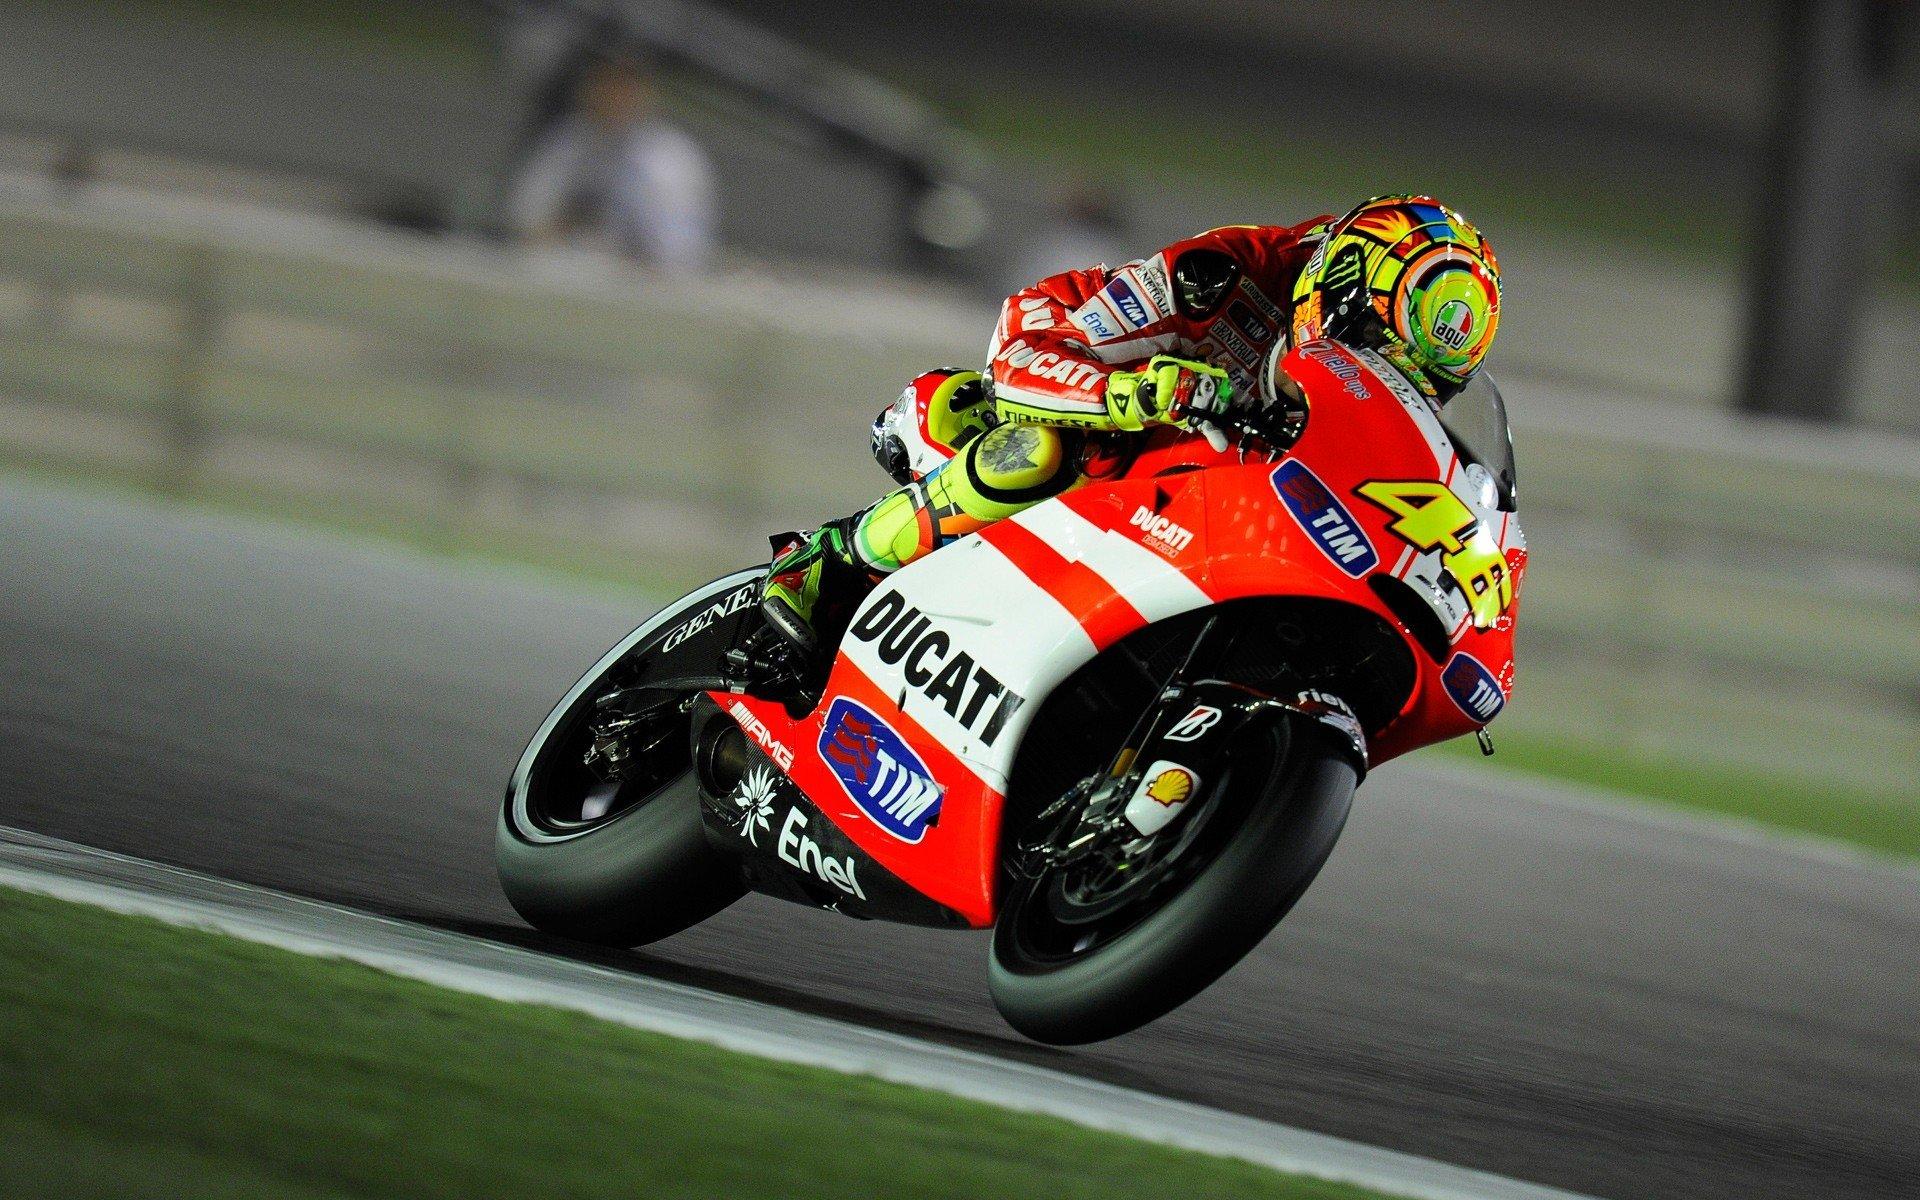 Motogp Wallpaper Hd 1080p Papel De Parede 1920x1200 Px Ducati Moto Gp Valentino